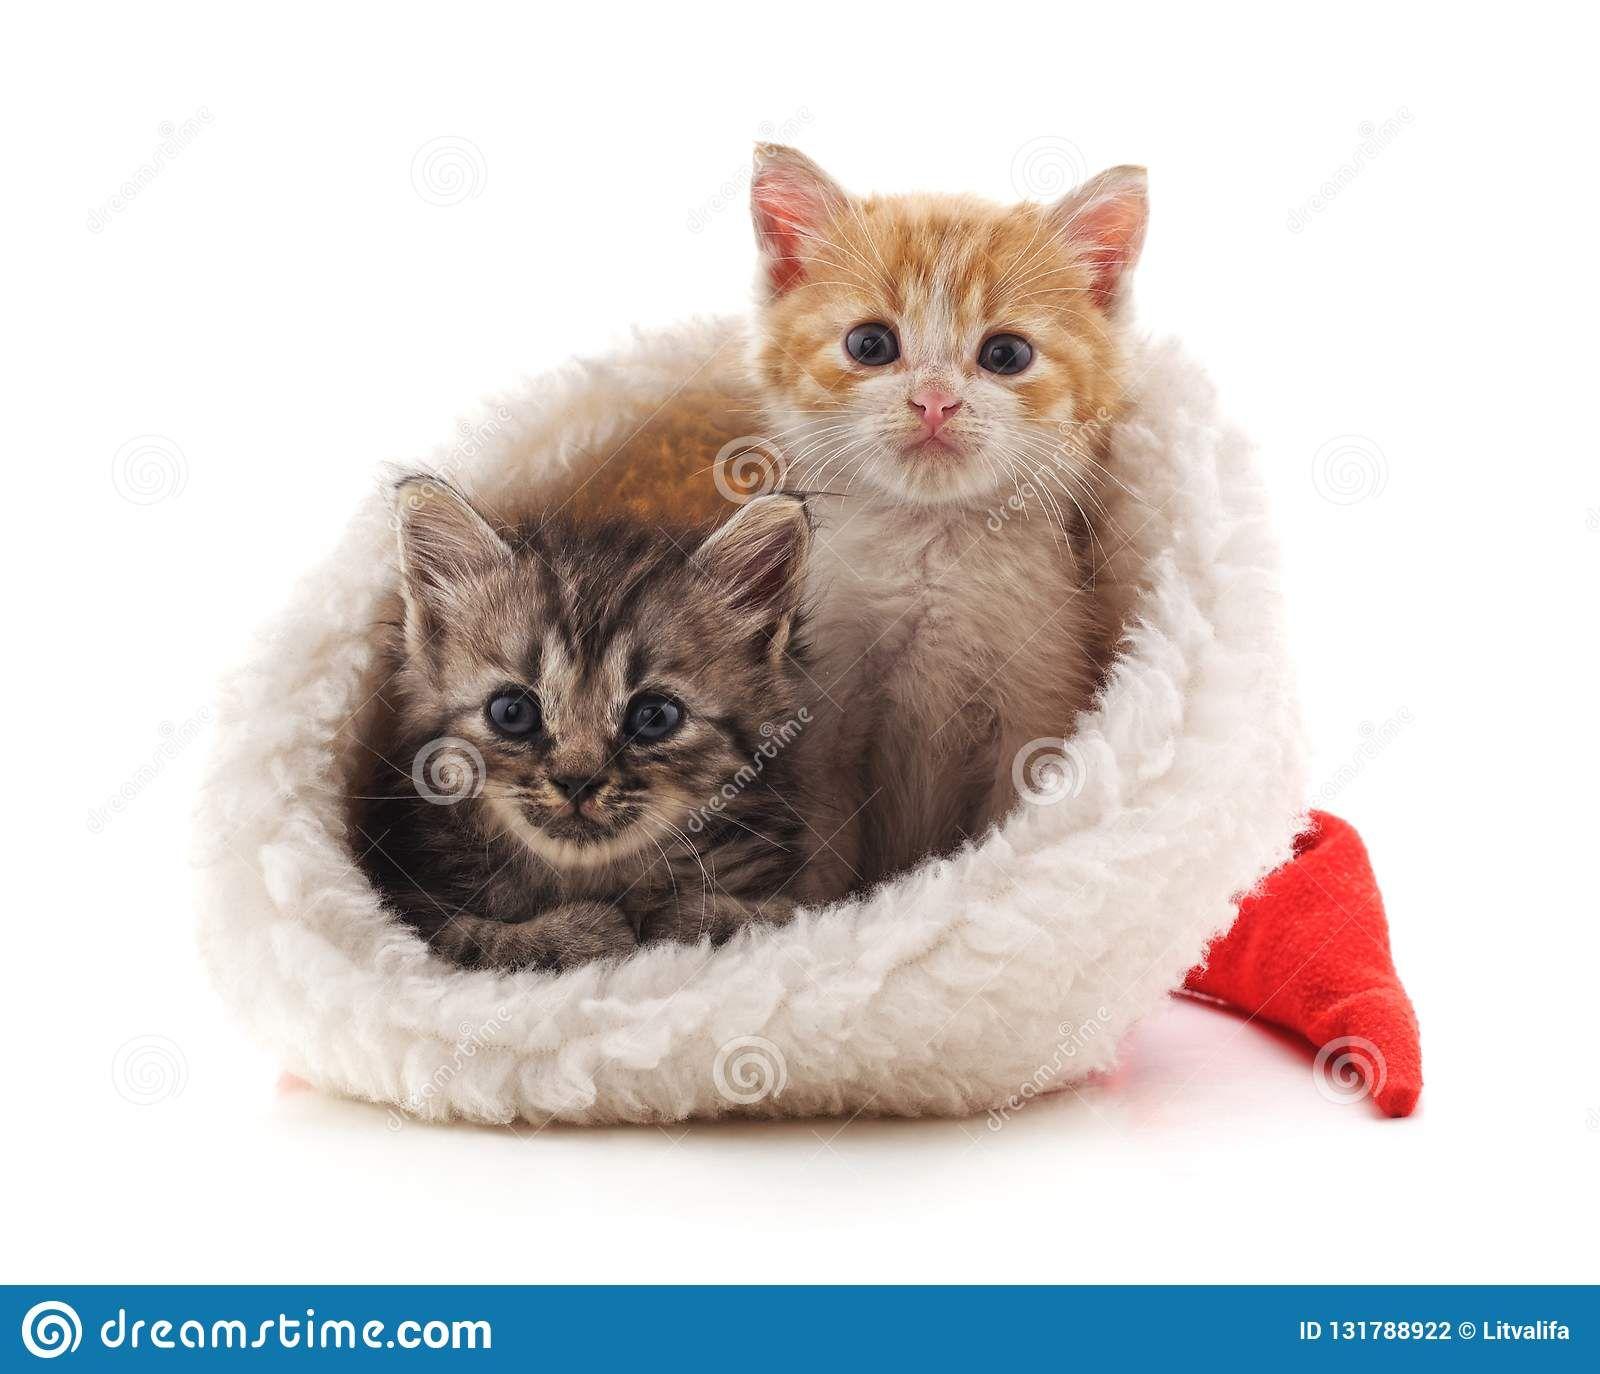 Little Kittens In A Christmas Hat Merrychristmas Christmas Cats Kitten Images Little Kittens Christmas Hat